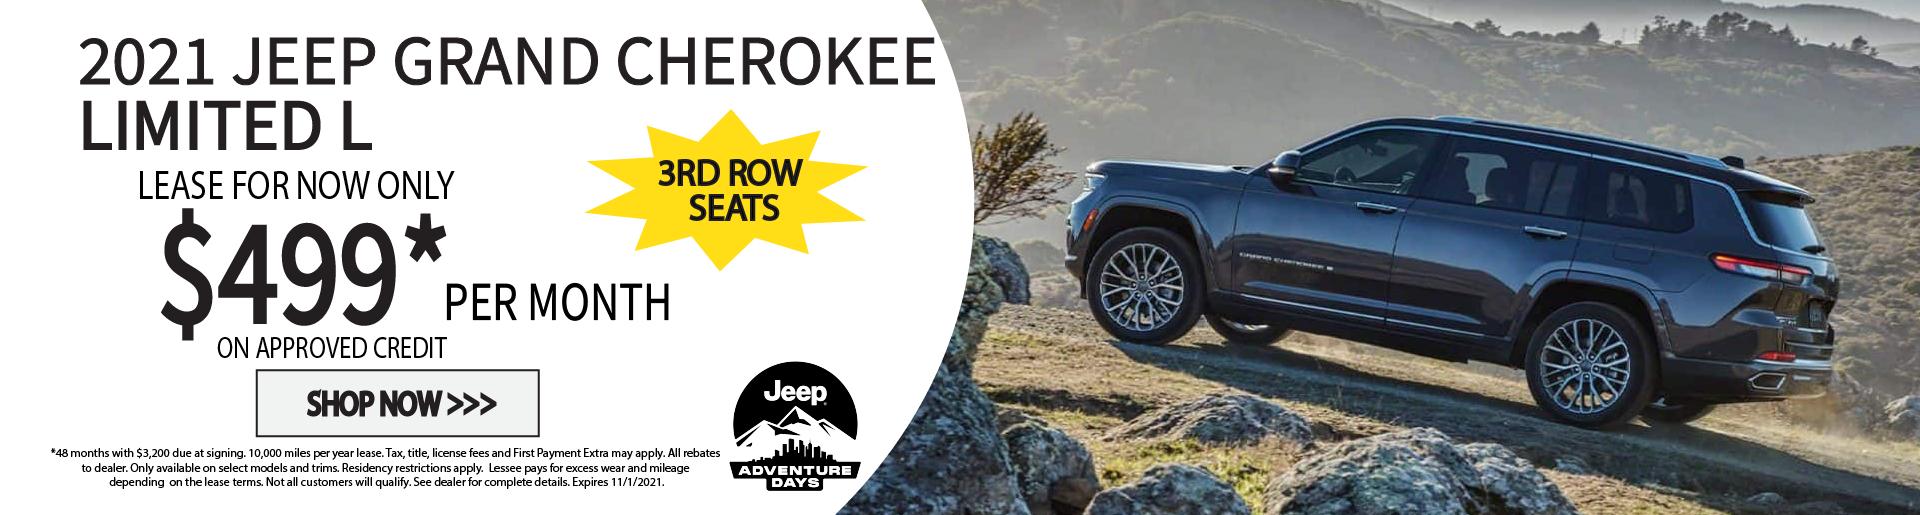 2021 jeep grand cherokee limited l